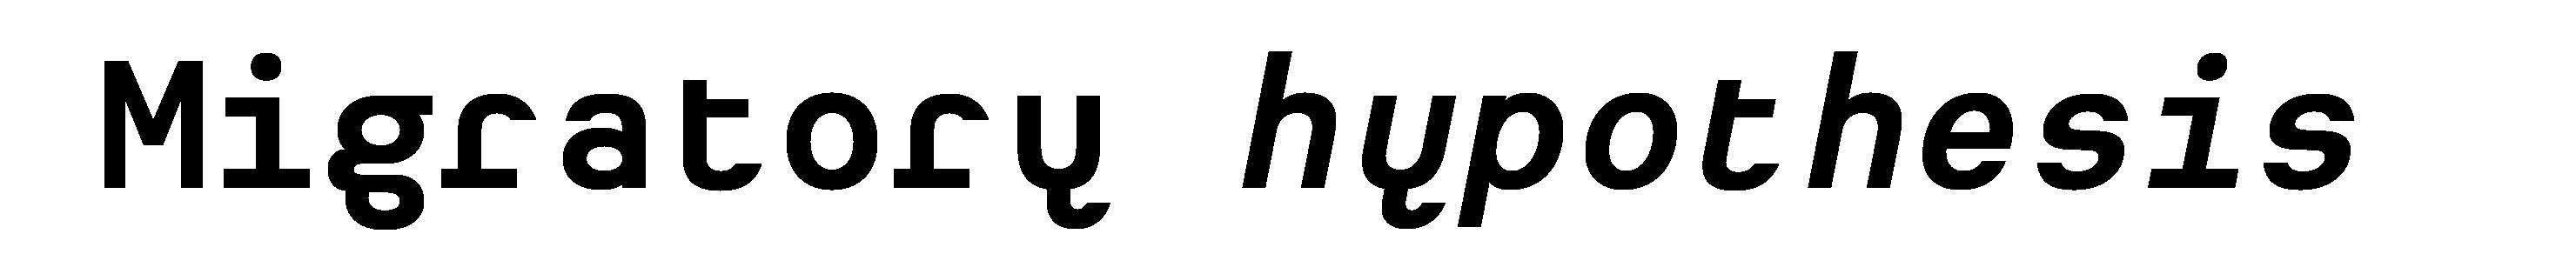 Typeface Heimat Mono D05 Atlas Font Foundry